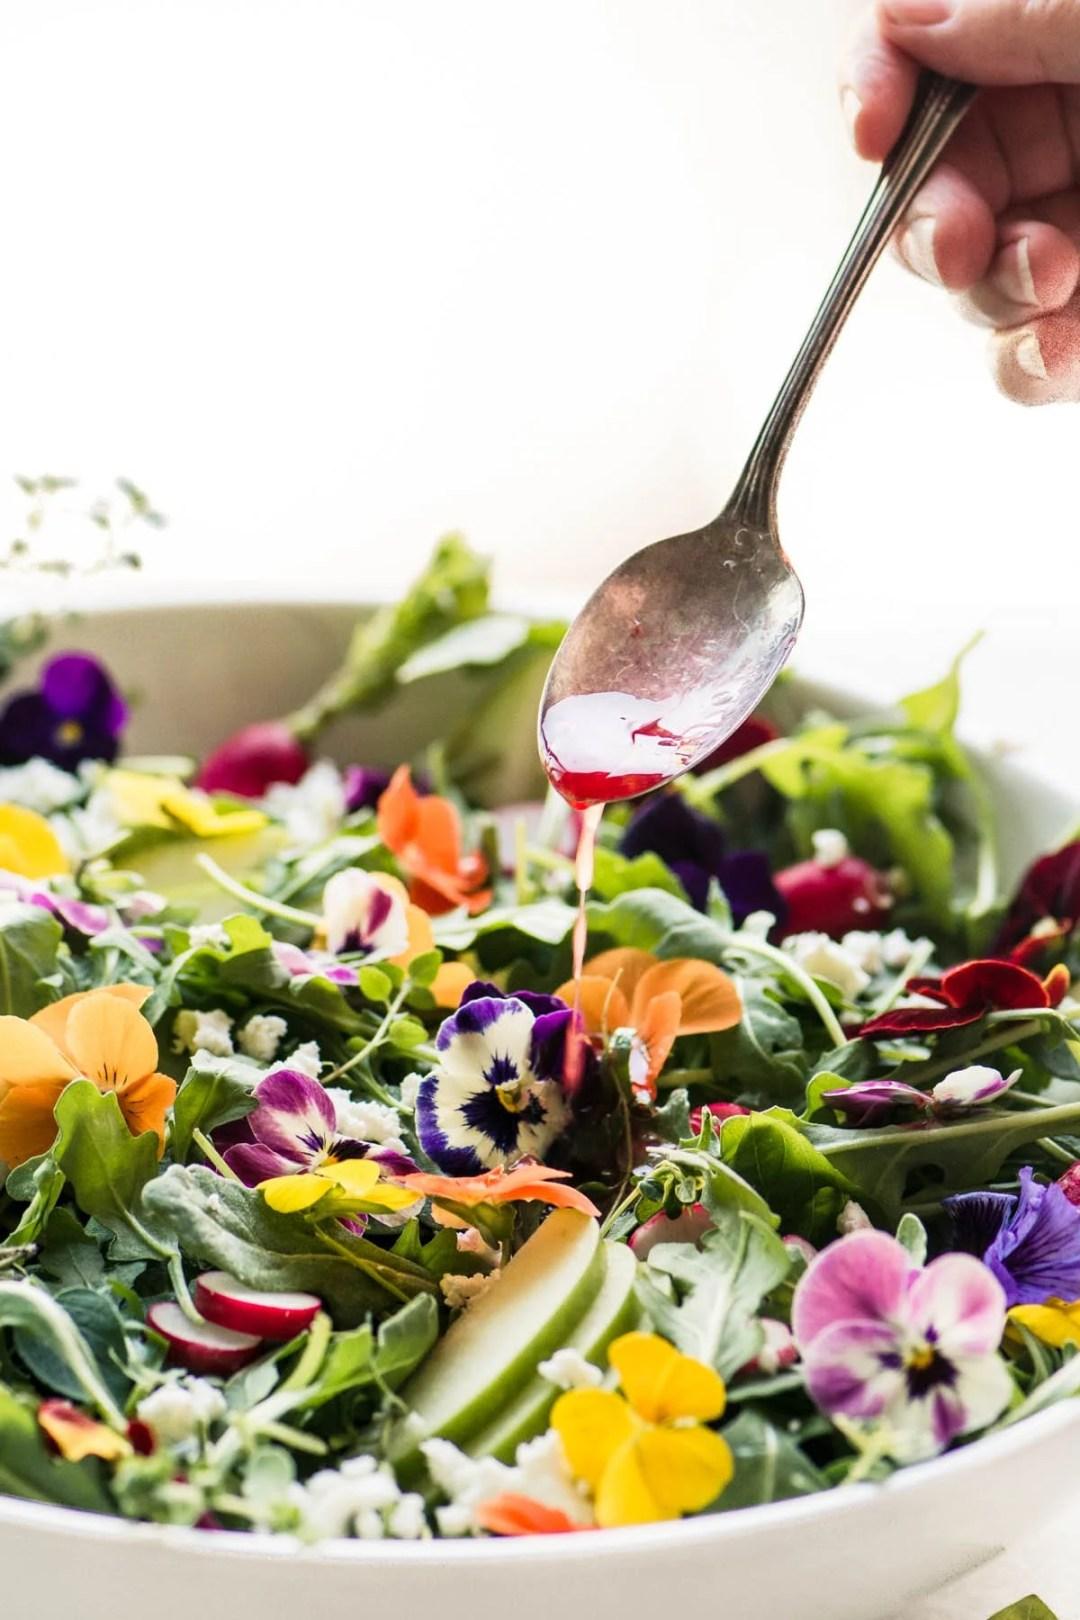 Winter Pansy Salad being dressed with blood orange vinaigrette